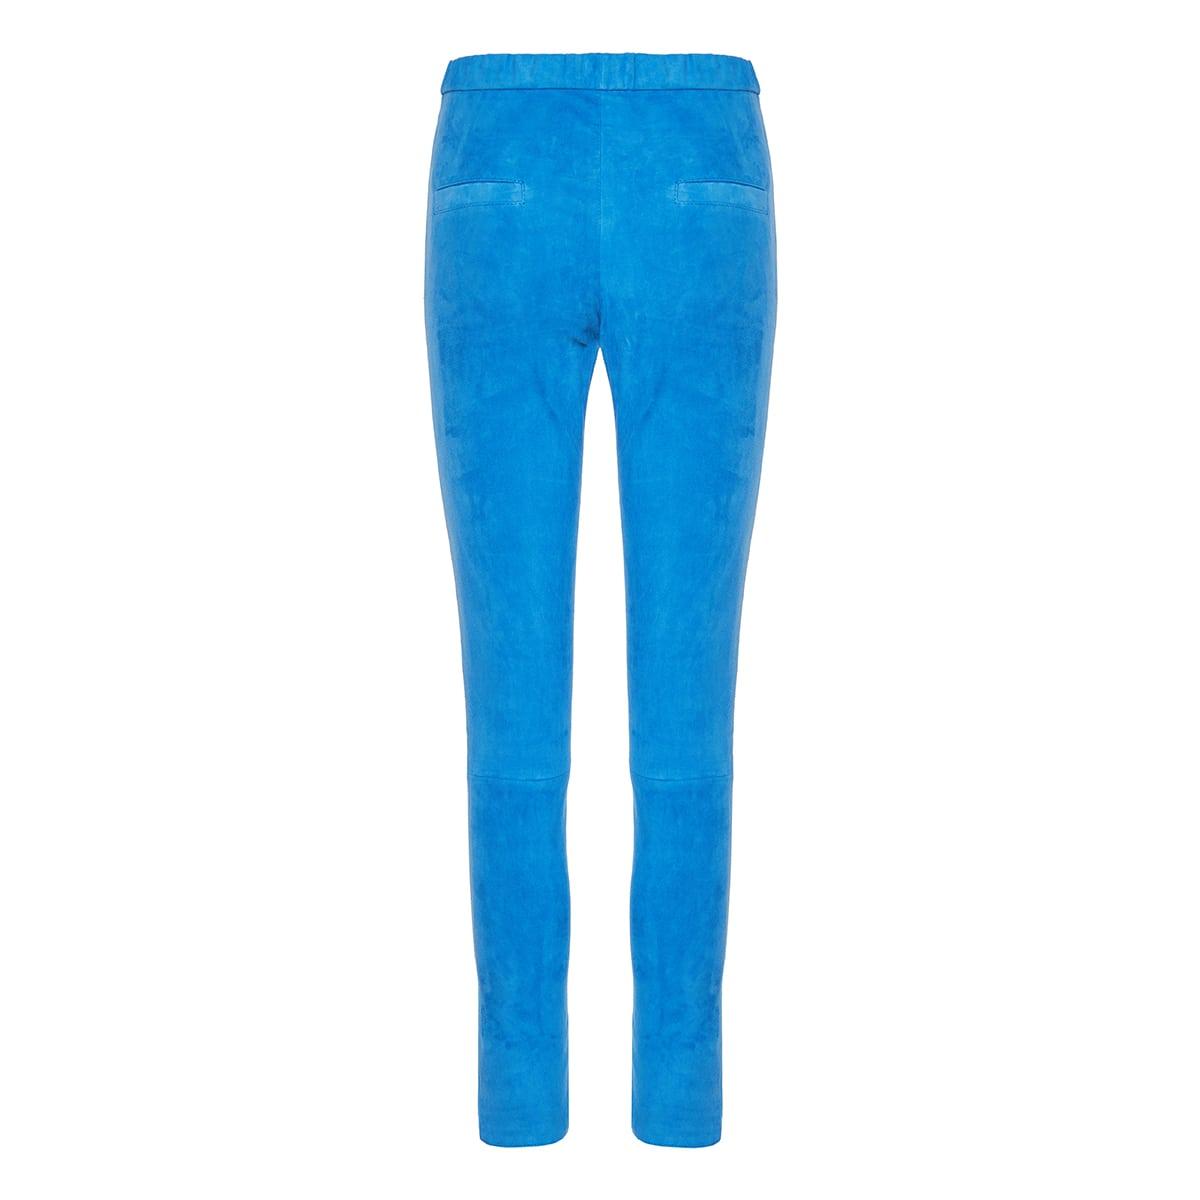 Ajuliko skinny-fit suede trousers